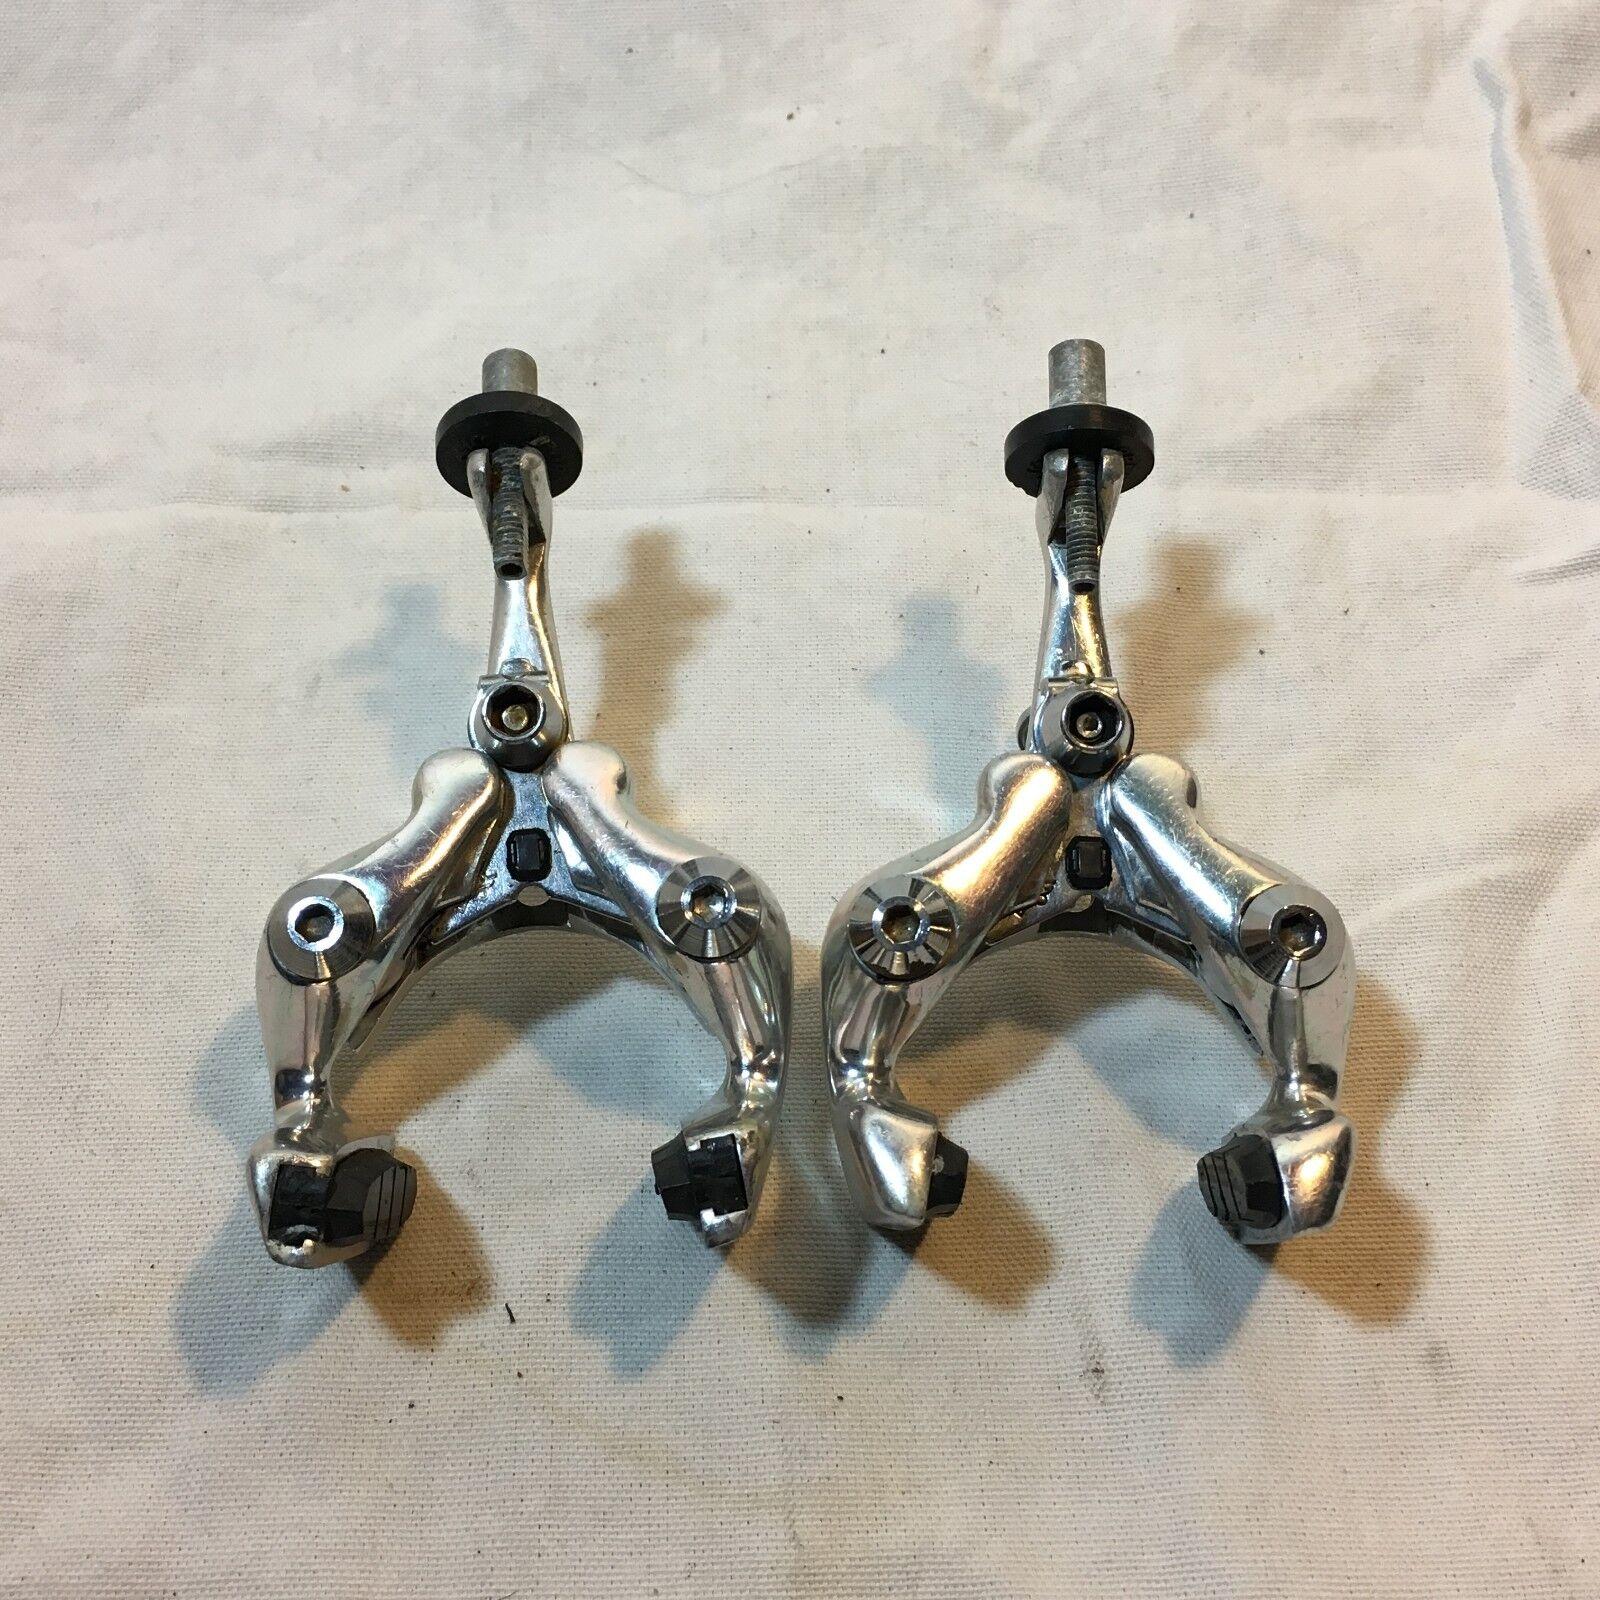 Dura Ace AX Brake Caliper set